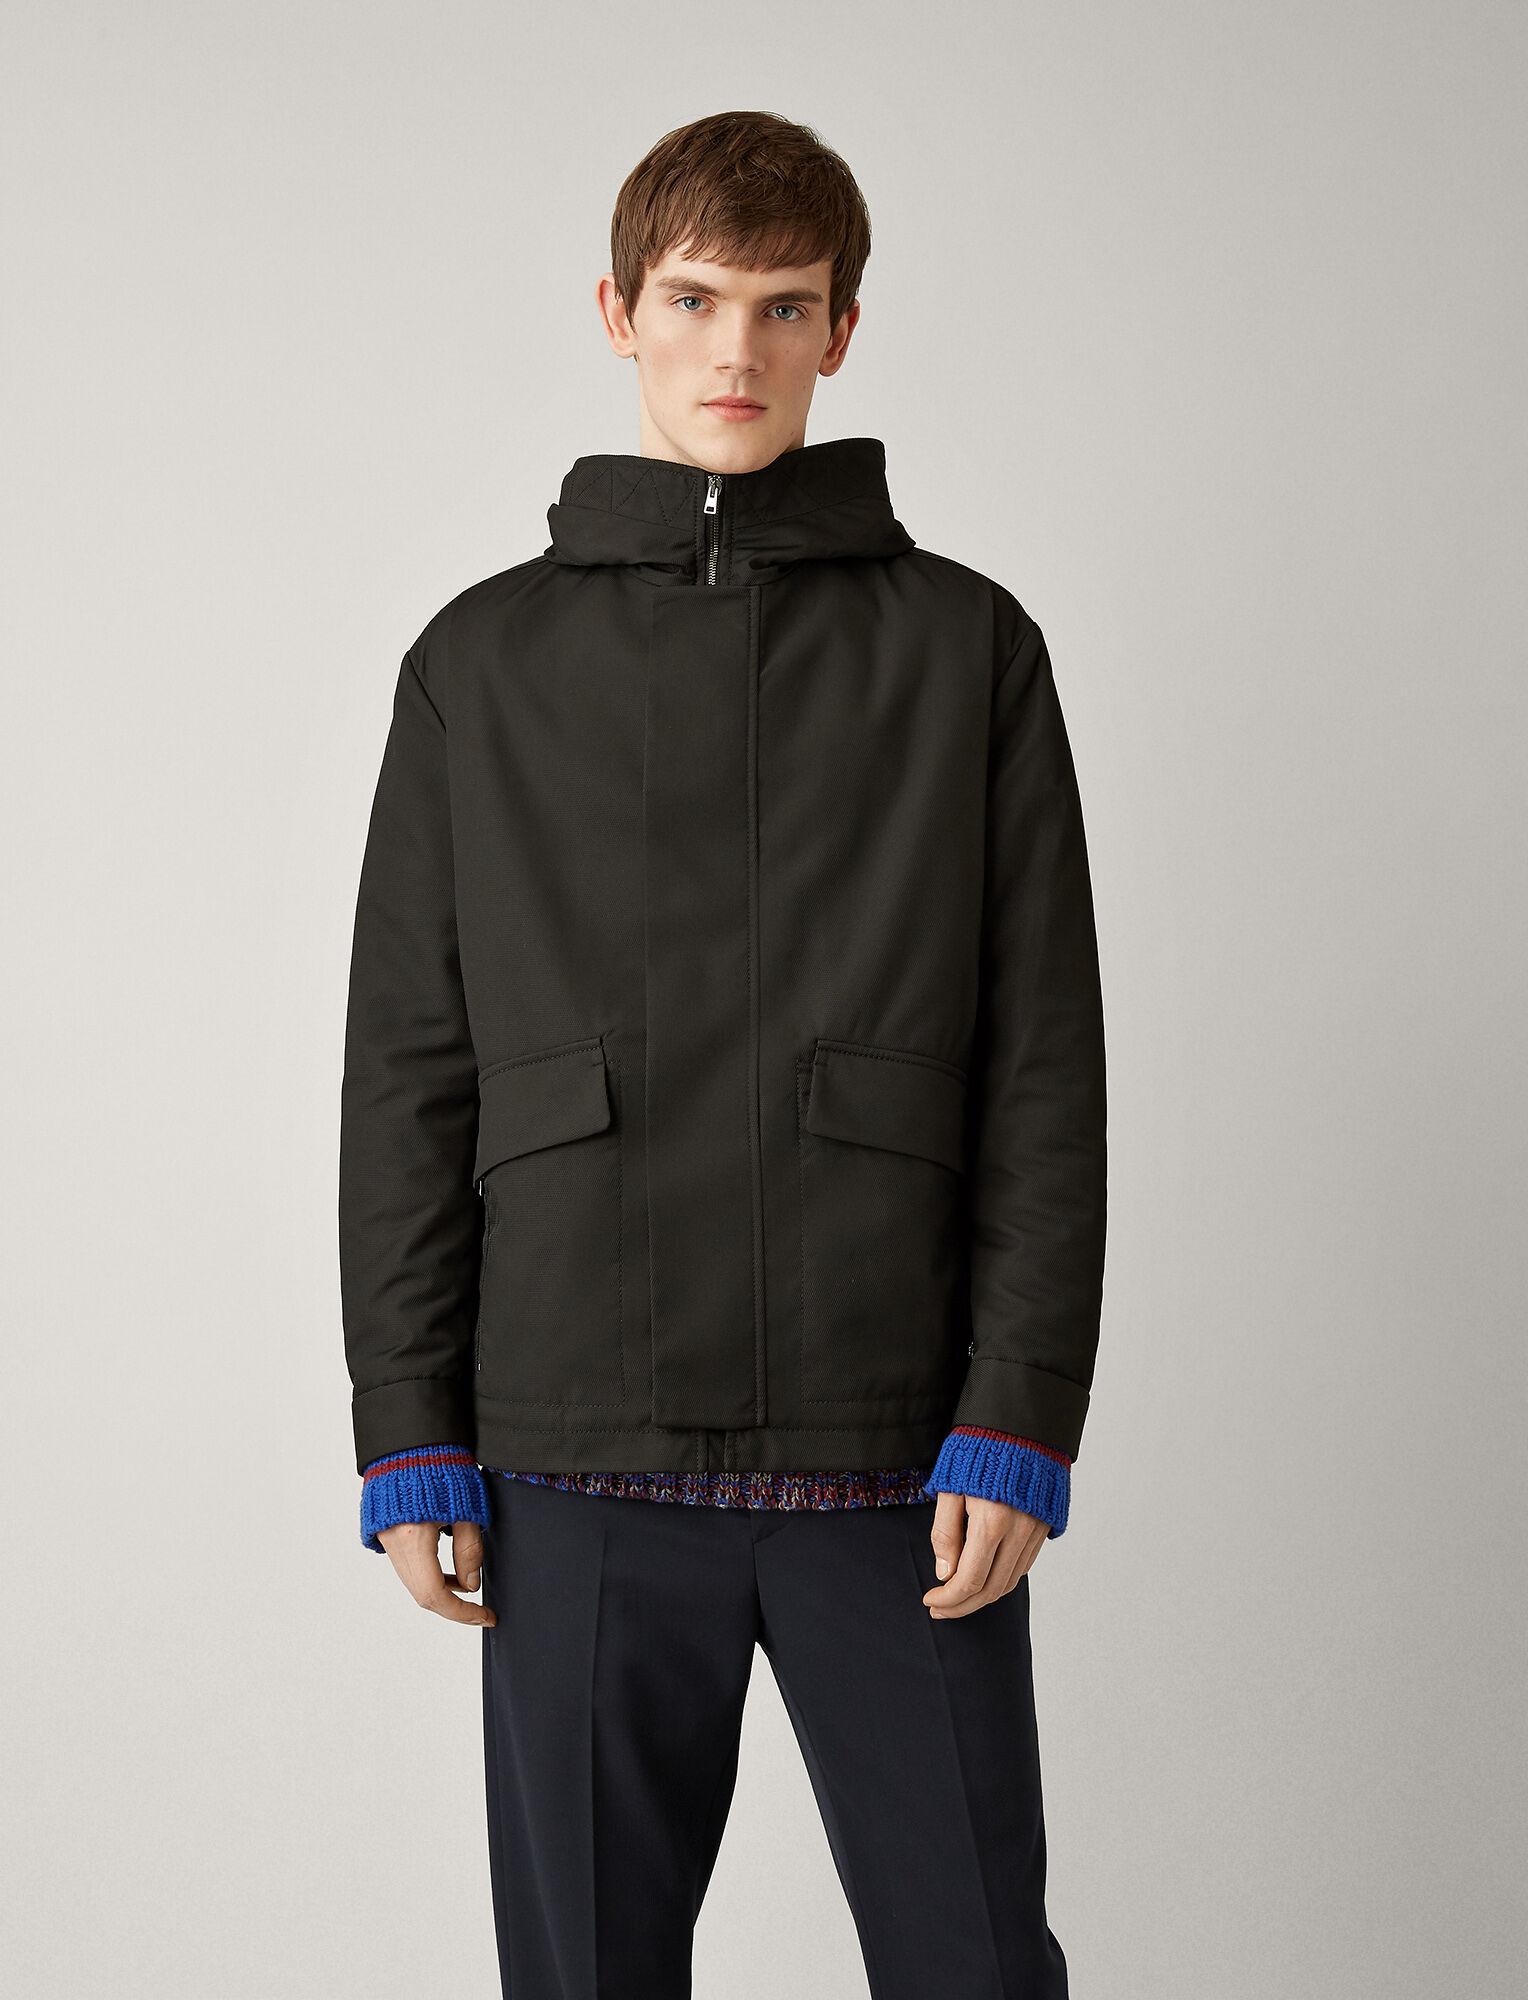 Joseph, Aspin Textured Nylon Coat, in BLACK